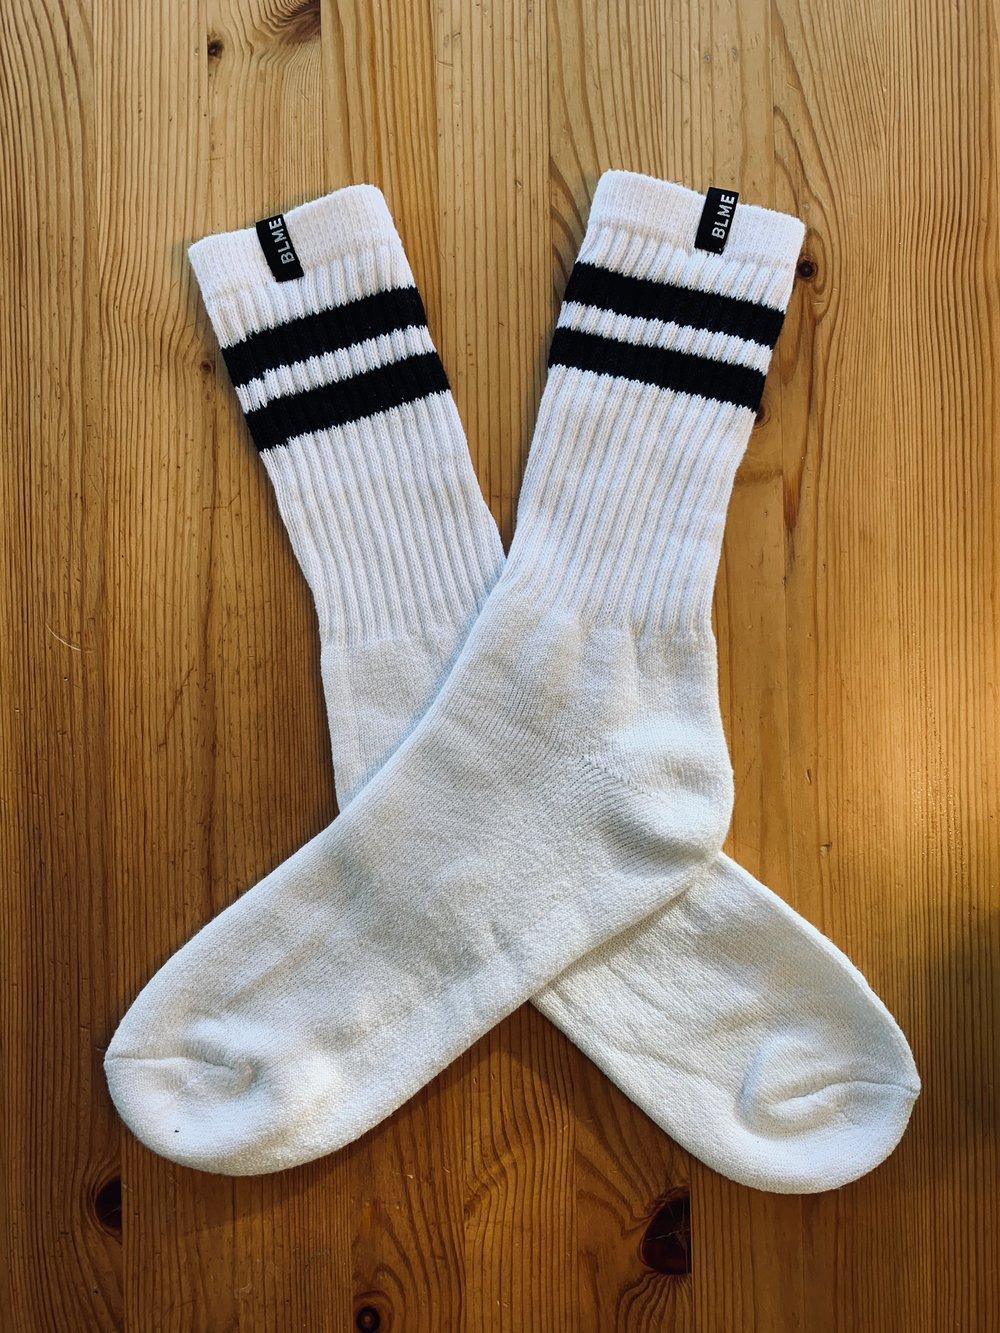 BLME Classic Crew Socks